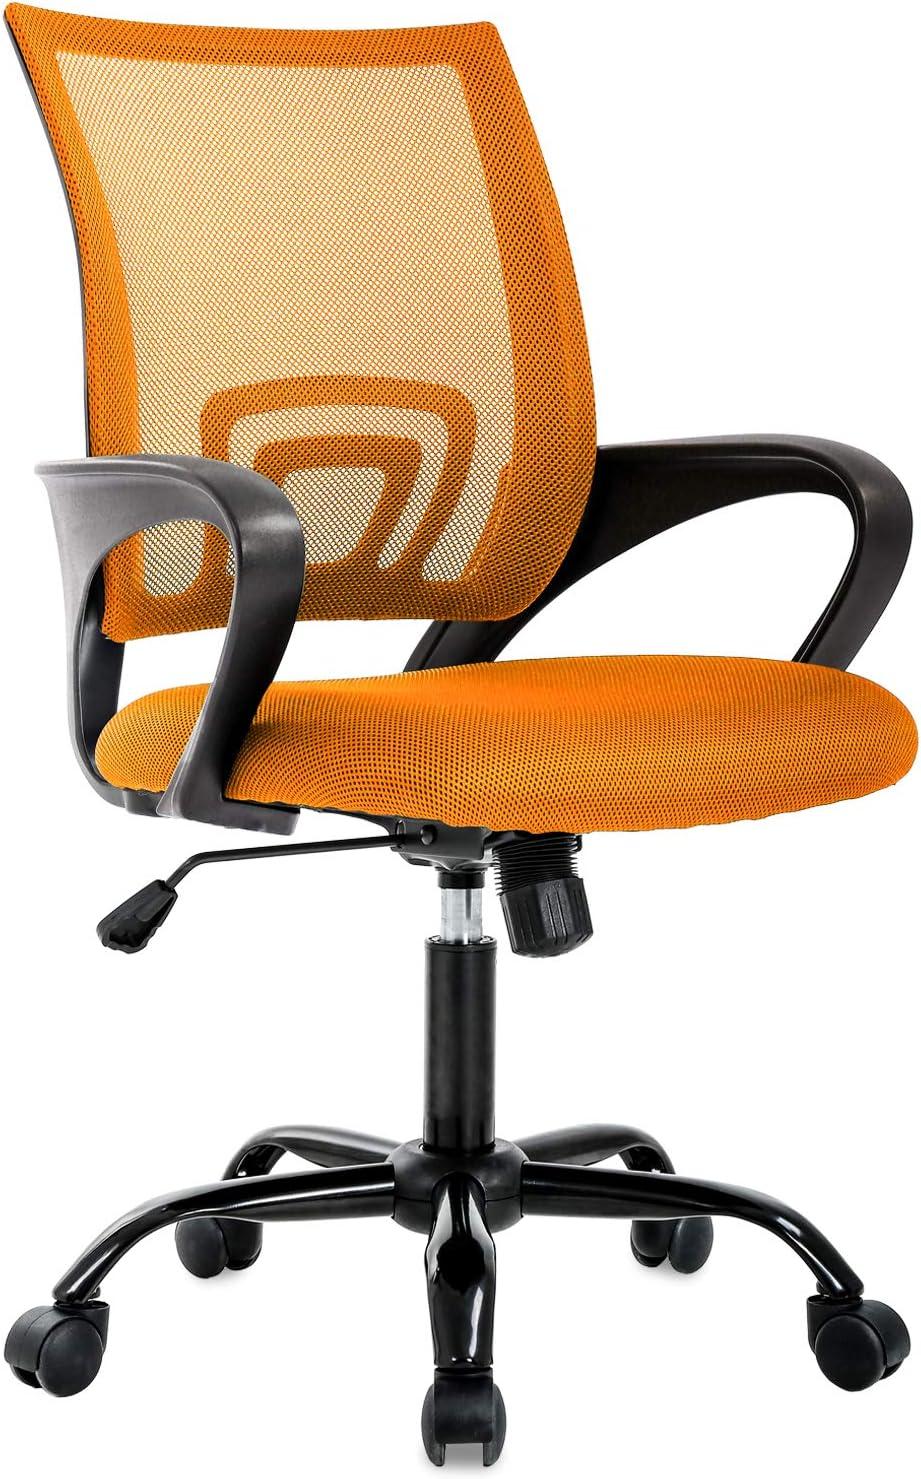 Ergonomic Office Chair Desk Chair Mesh Computer Chair Back Support Modern Executive Adjustable Chair Task Rolling Swivel Chair for Women, Men (Orange)